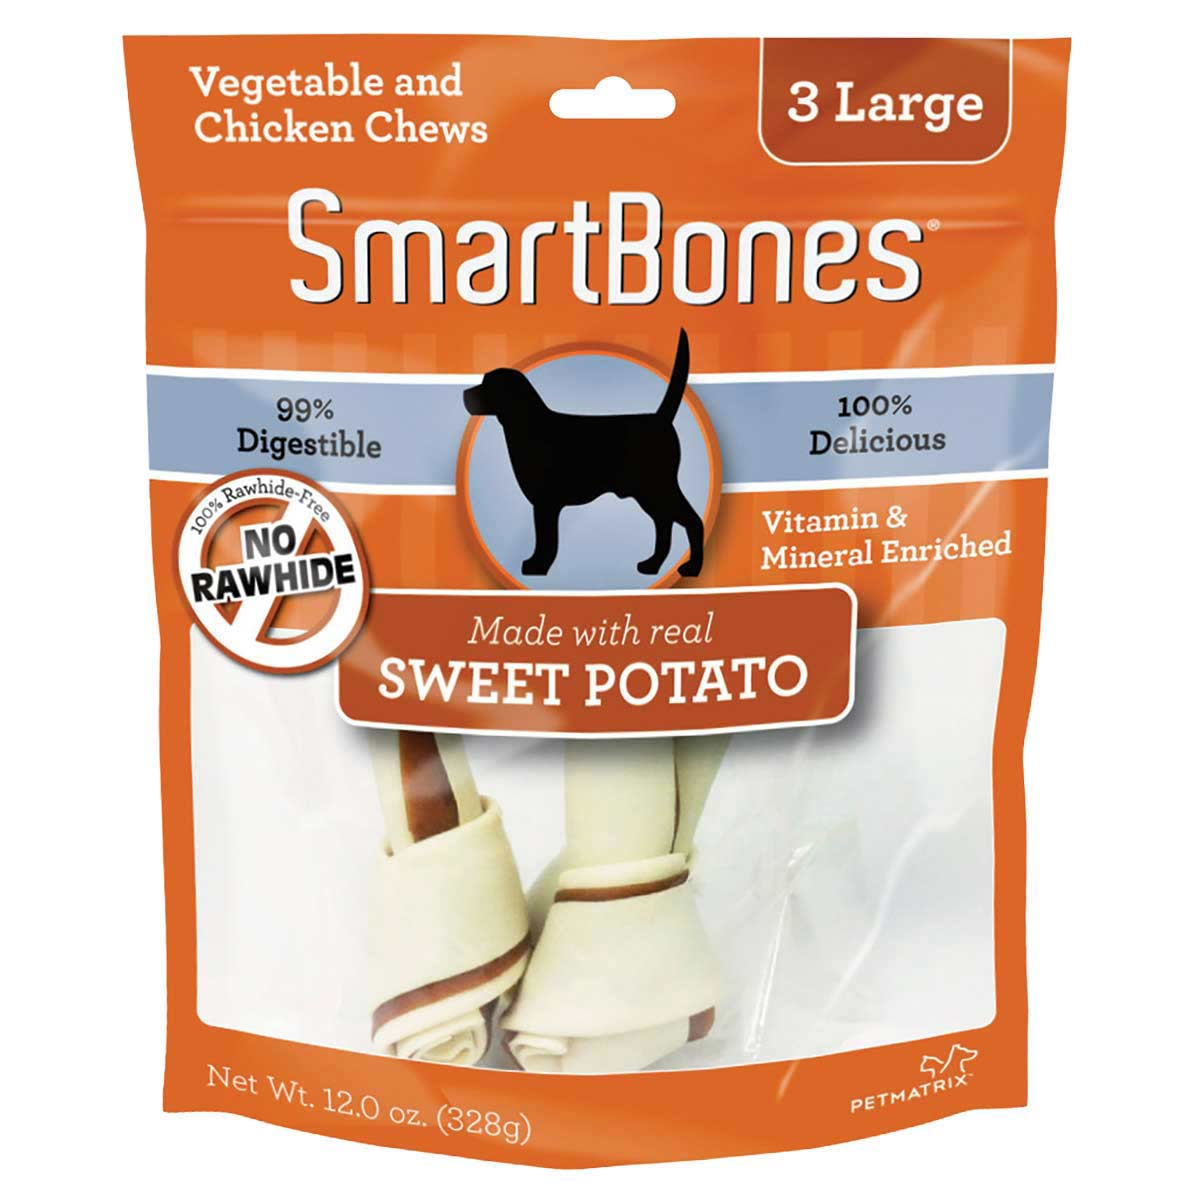 Rawhide Alternative SmartBones Sweet Potato Bone Chews for Dogs - 7 inch Large 3 Pack